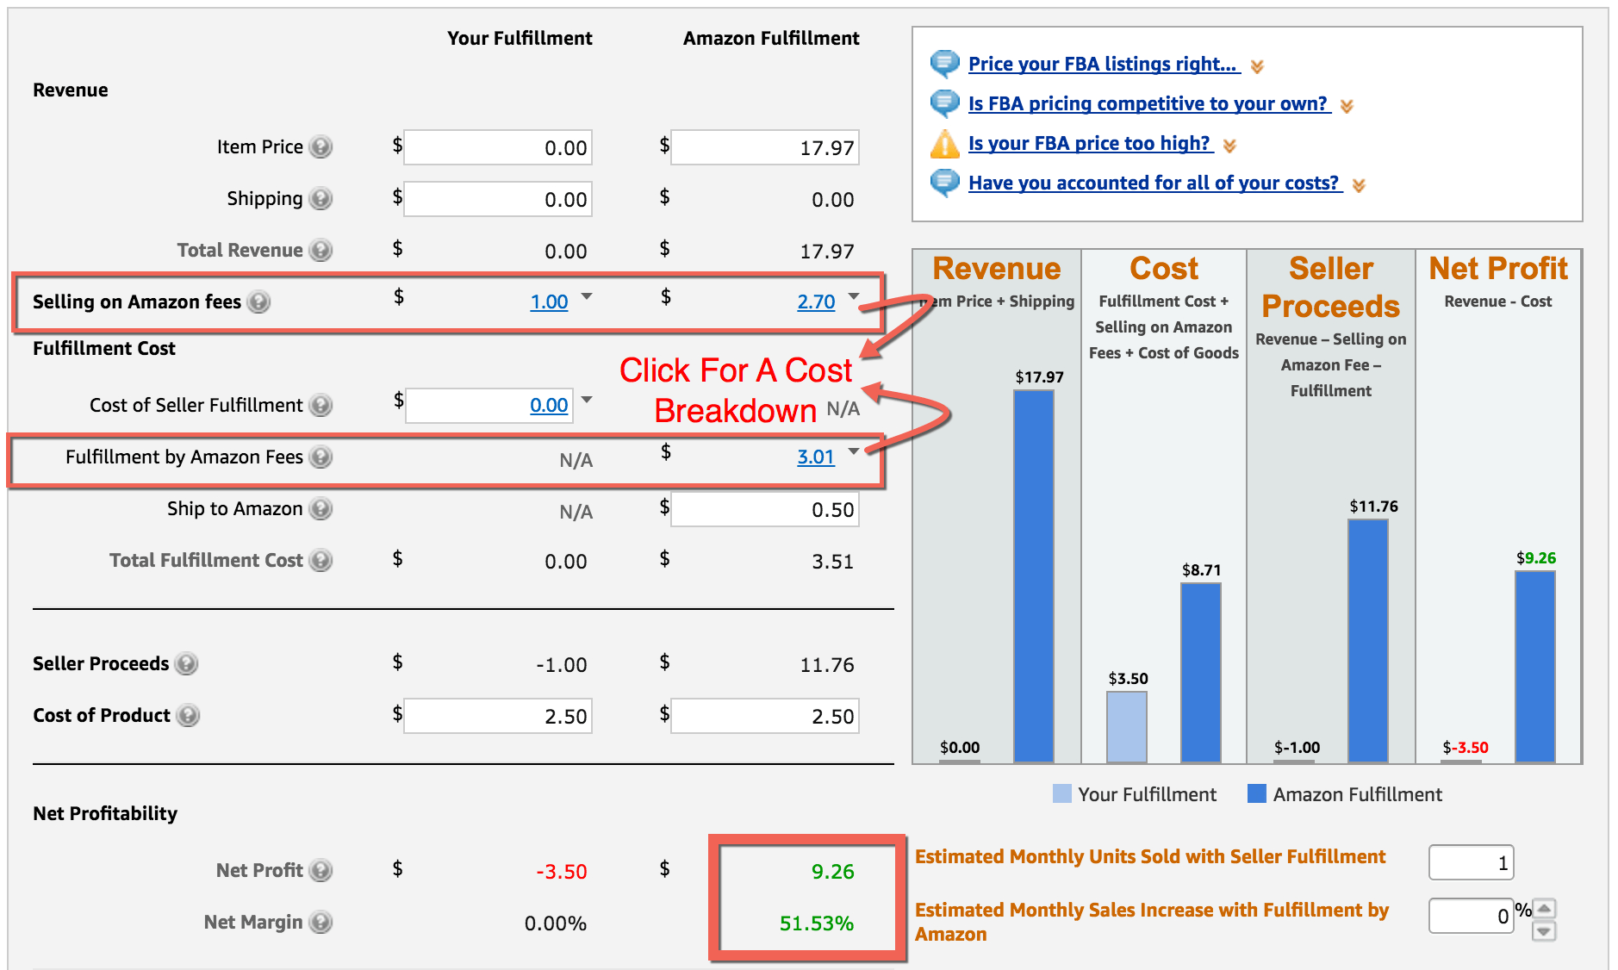 Amazon Fba Seller Sales & Profit Excel Spreadsheet In Fba Calculator: Free Tool To Calculate Amazon Fees, Profit  Revenue